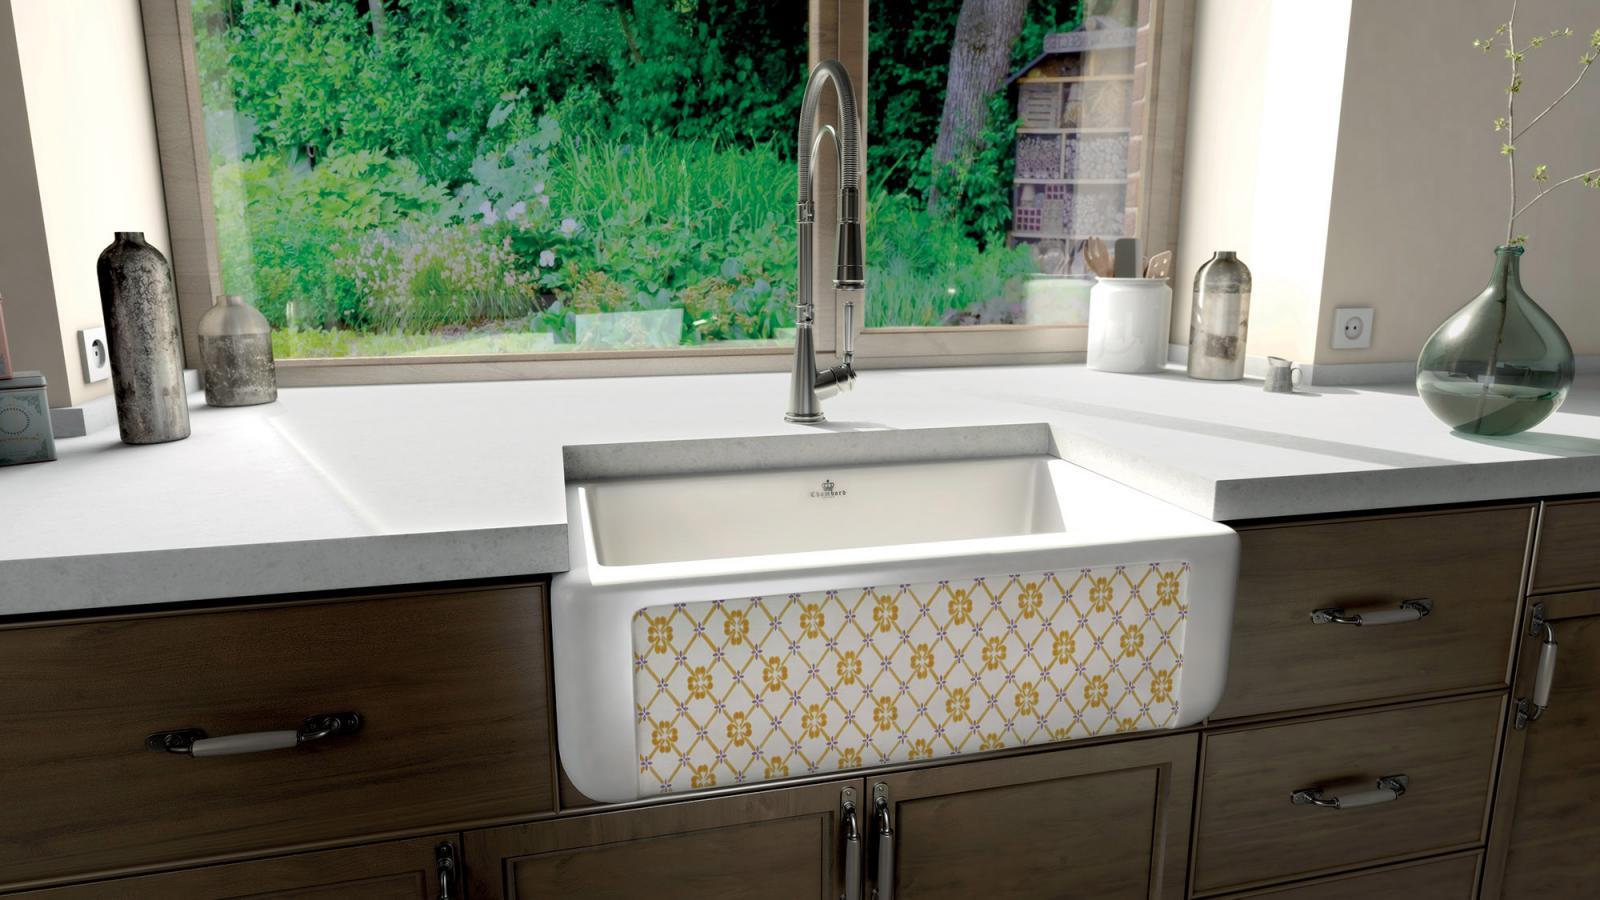 High-quality sink Henri II Le Grand Province - single bowl, ceramic